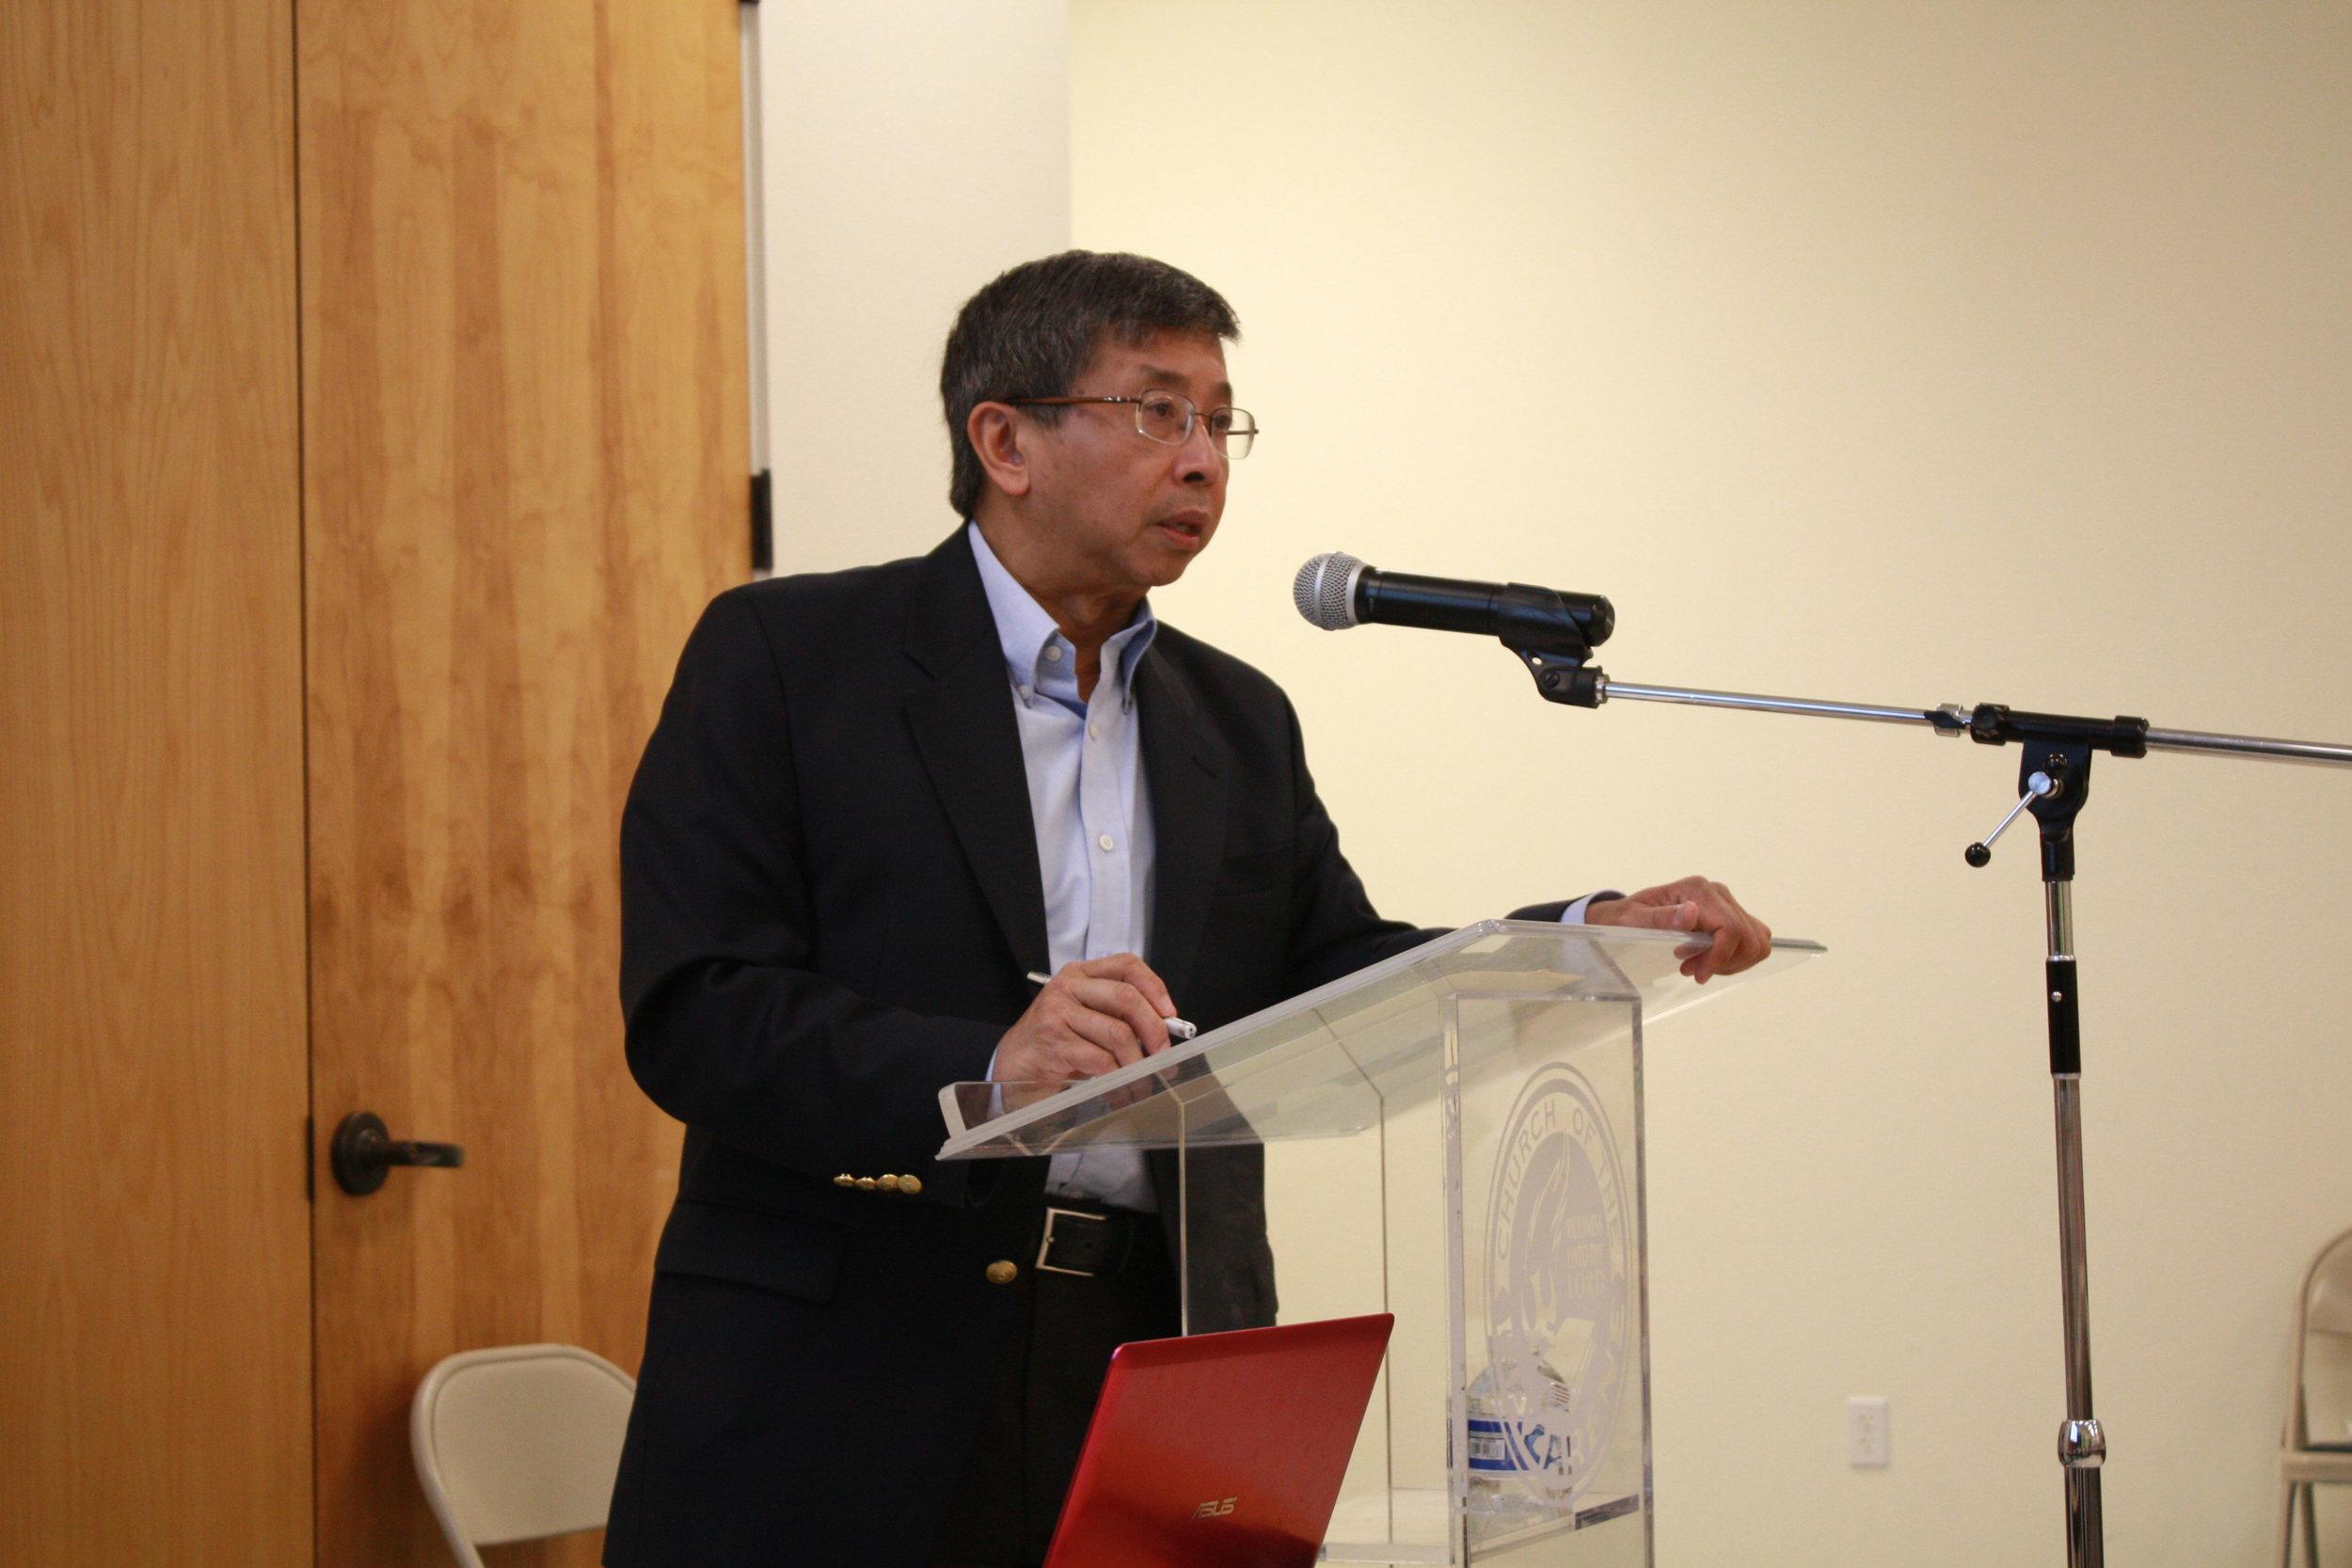 Mr. SW Lam website is www.moneyradio.org